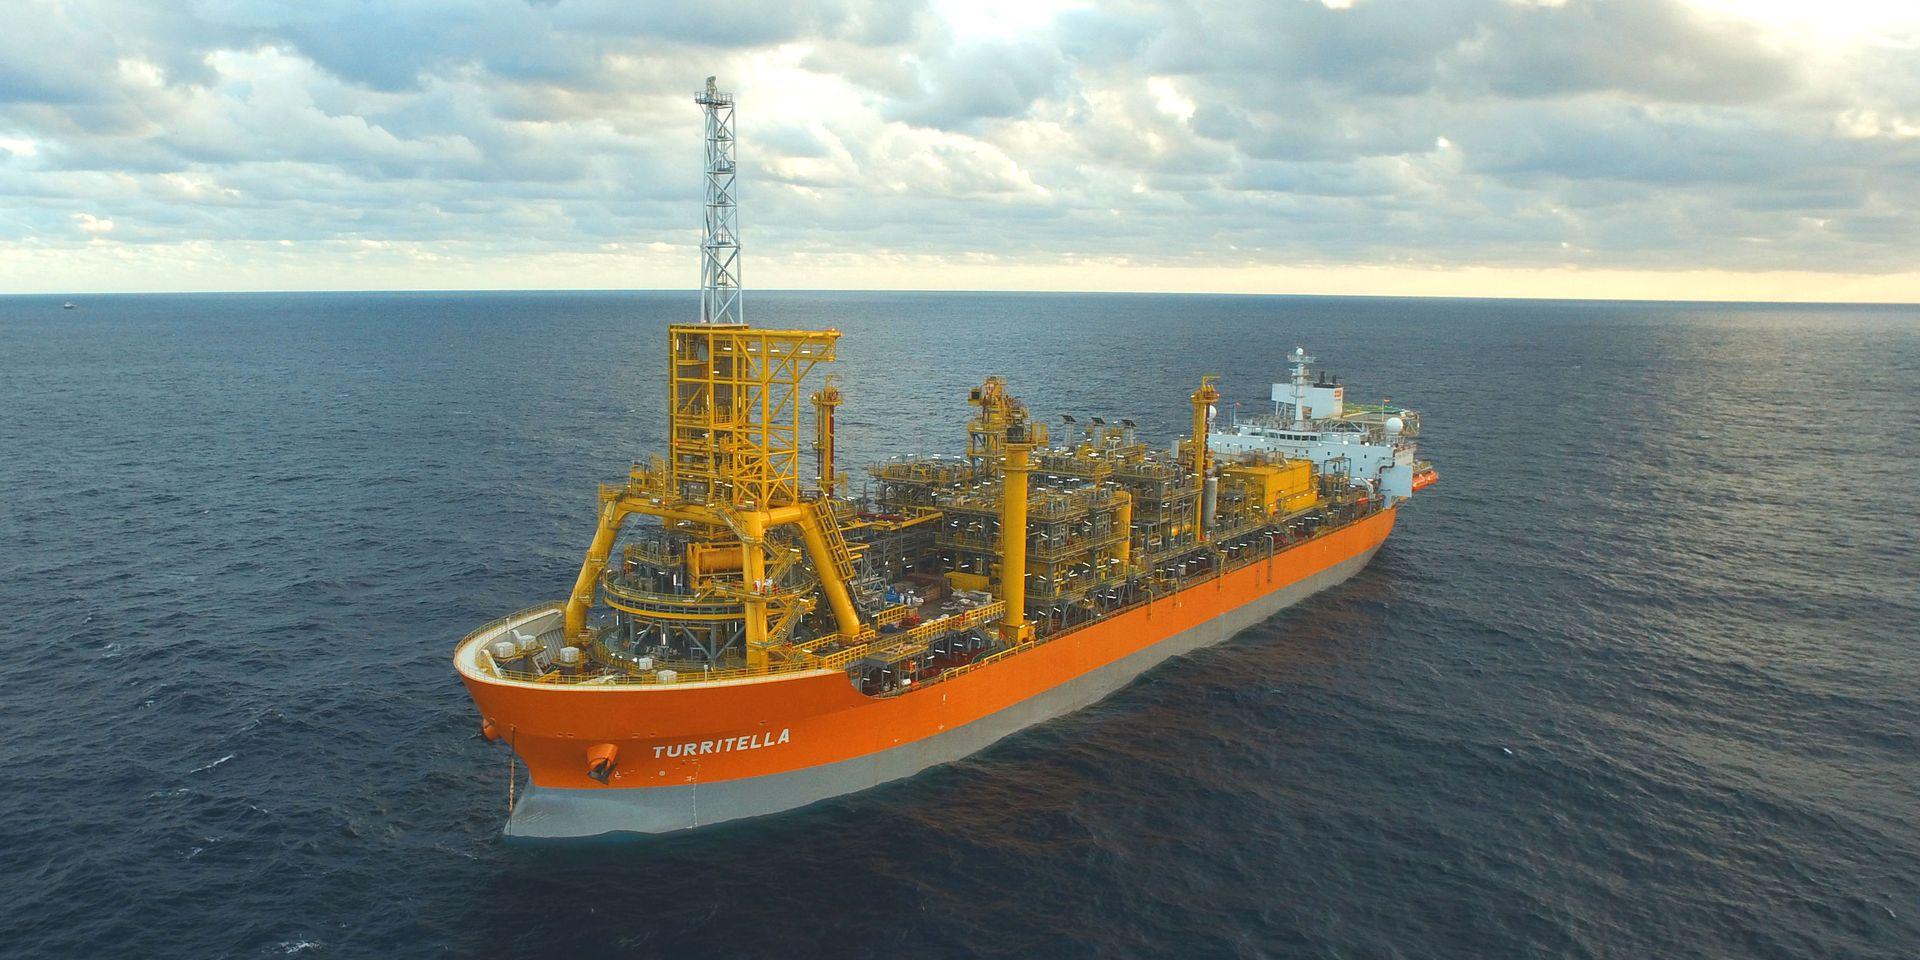 Adviesverhoging SBM Offshore